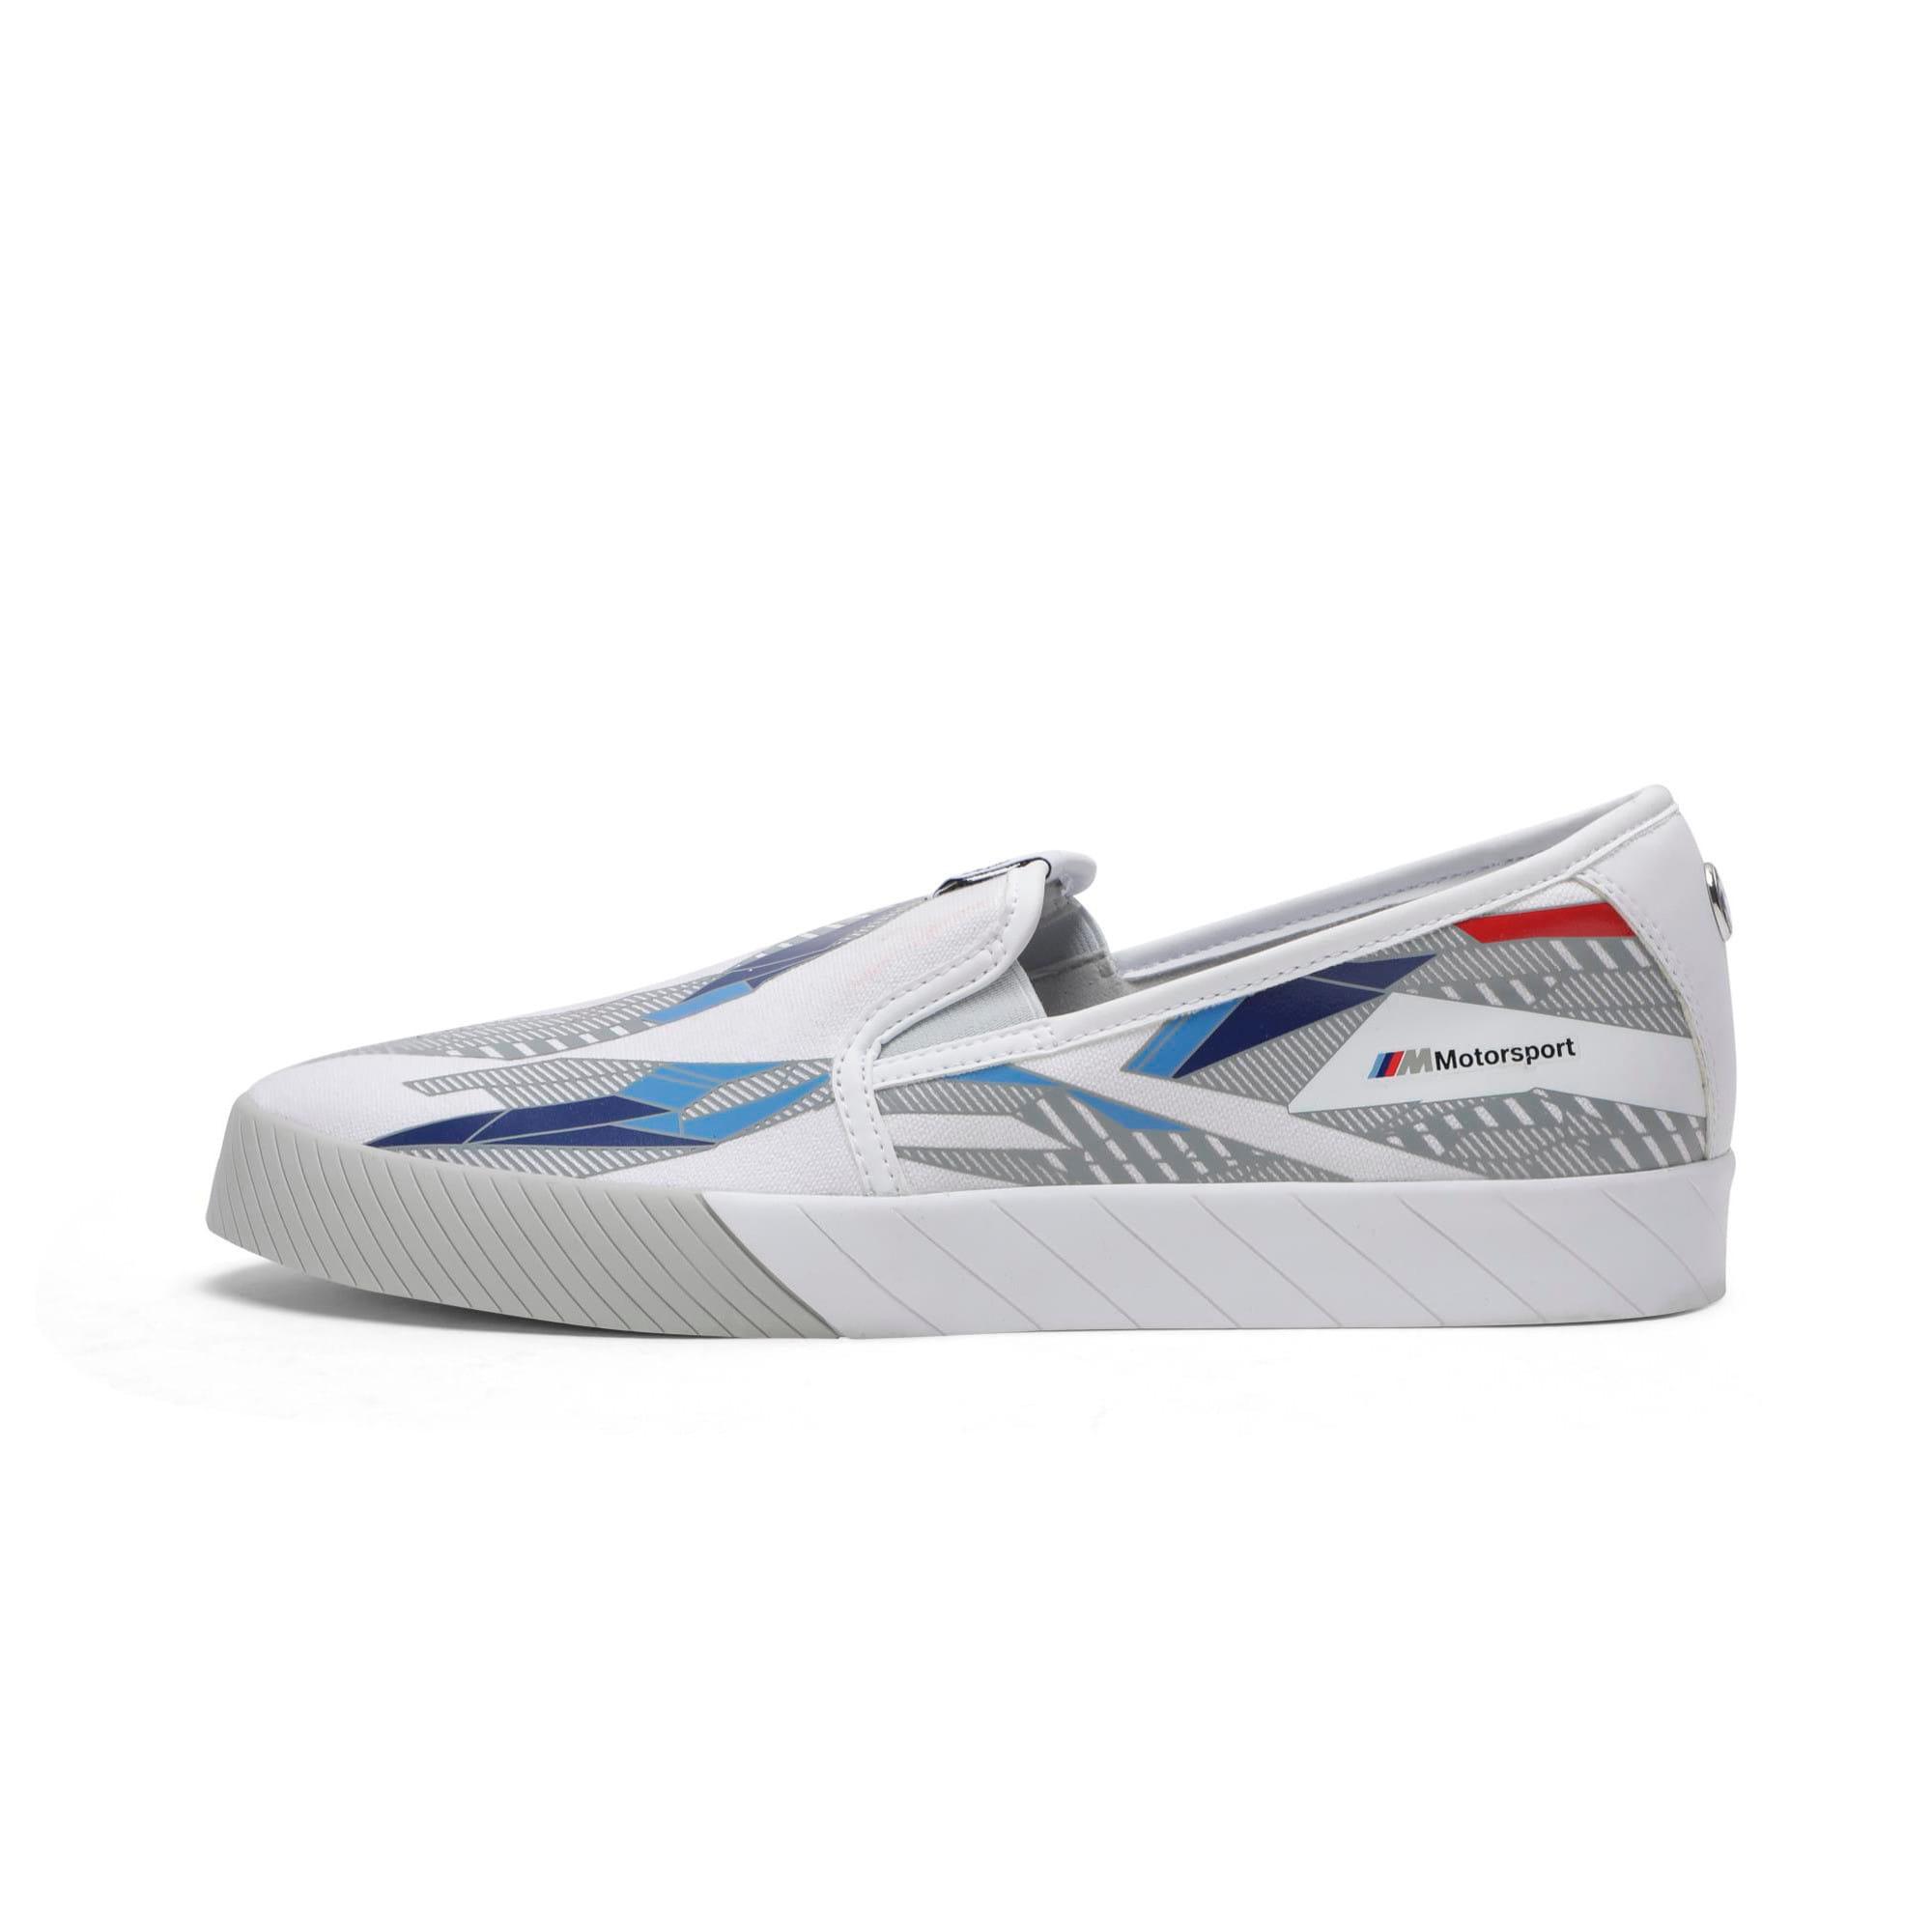 Thumbnail 1 of BMW M Slip-On Track Shoes, Puma White-Gray Violet, medium-IND